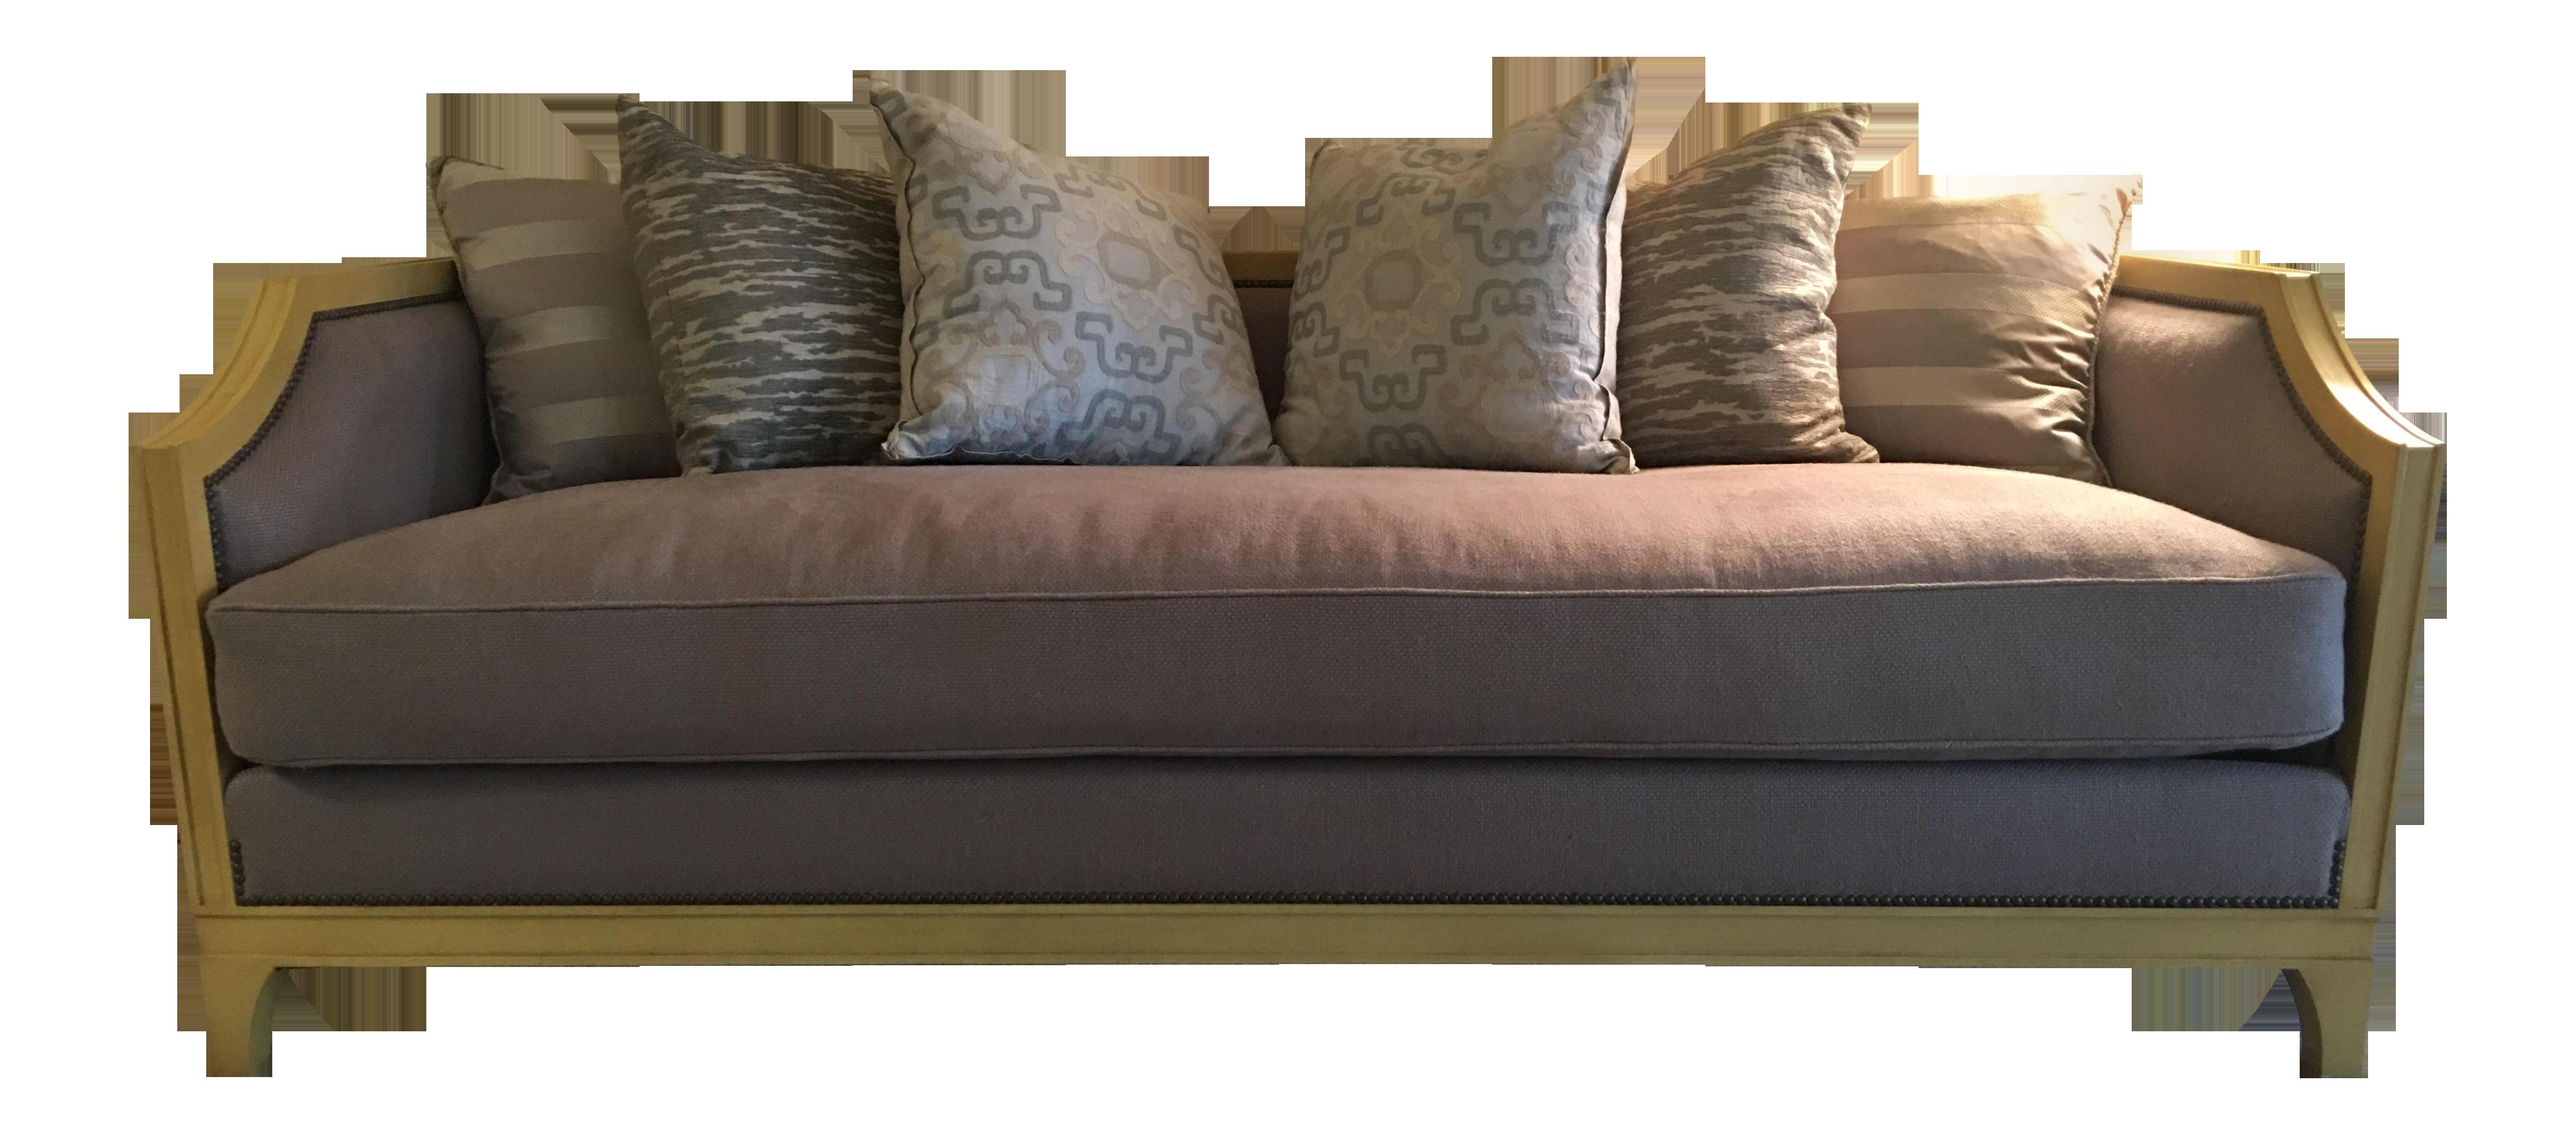 Custom Settee Sofa With Pillows